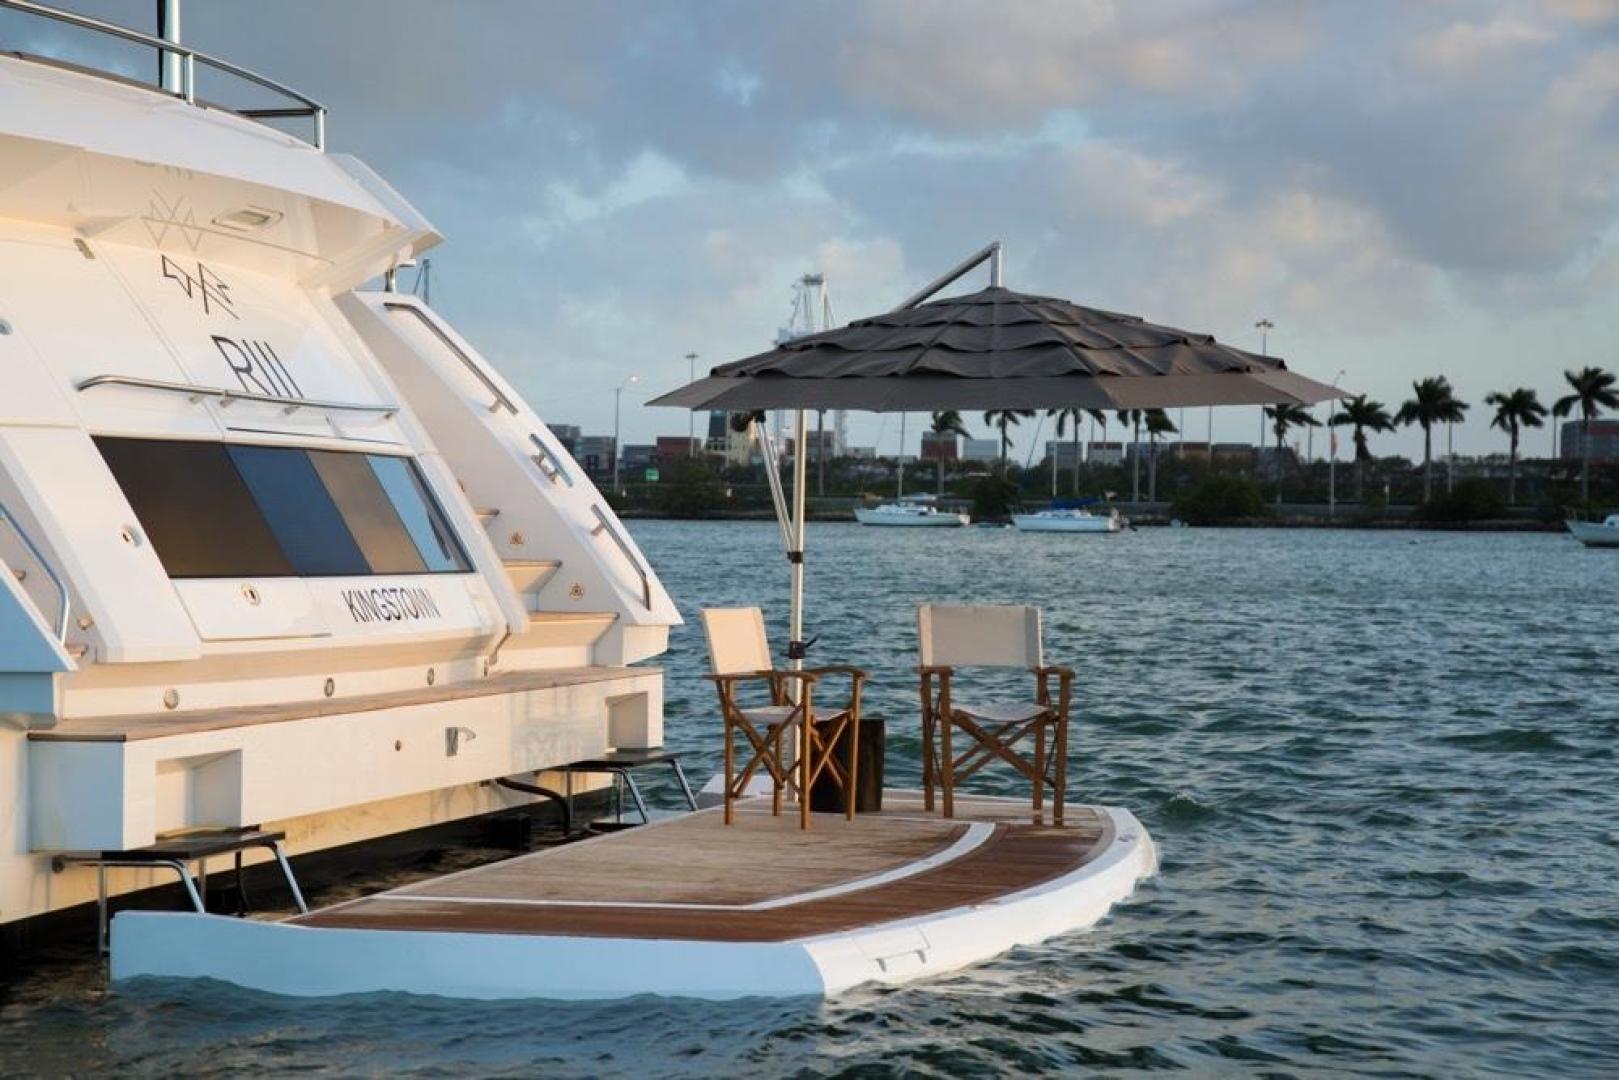 Sunseeker-28 Metre Yacht 2016-RIII Miami-Florida-United States-2016 SUNSEEKER 92 RIII FOR SALE-600084 | Thumbnail